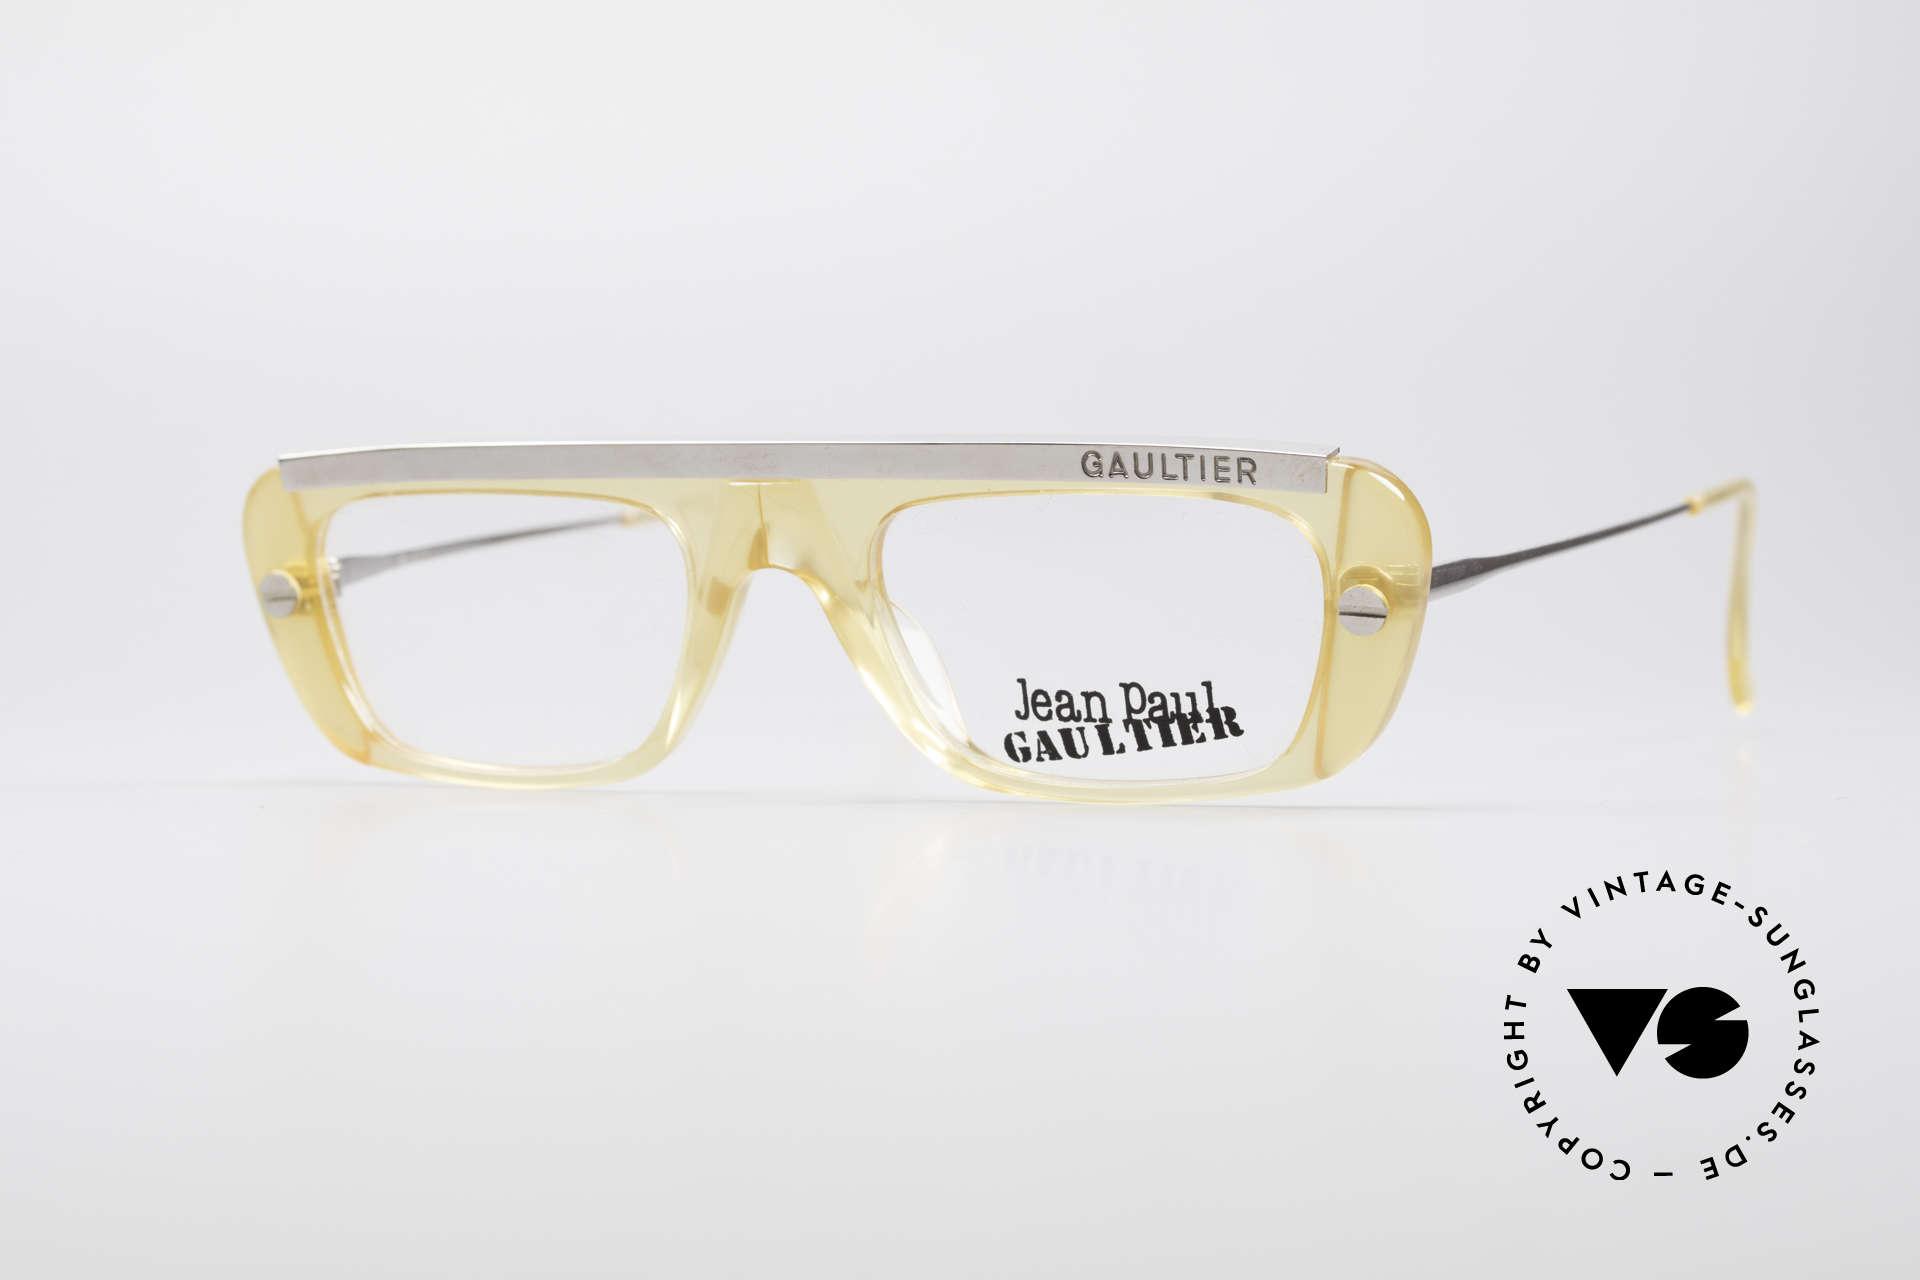 Jean Paul Gaultier 55-0771 Striking Vintage JPG Frame, striking Jean Paul GAULTIER vintage eyeglasses, Made for Men and Women